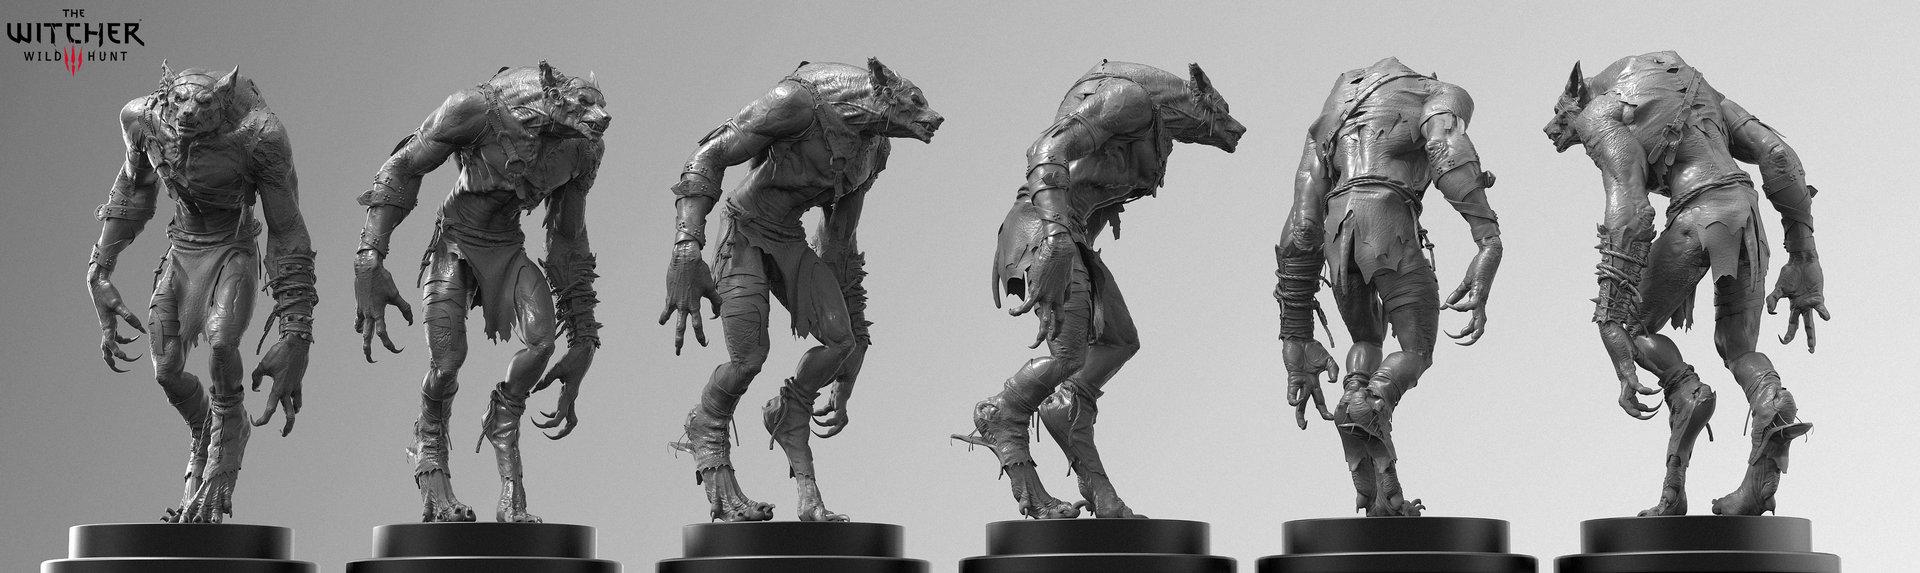 Marcin klicki werewolf